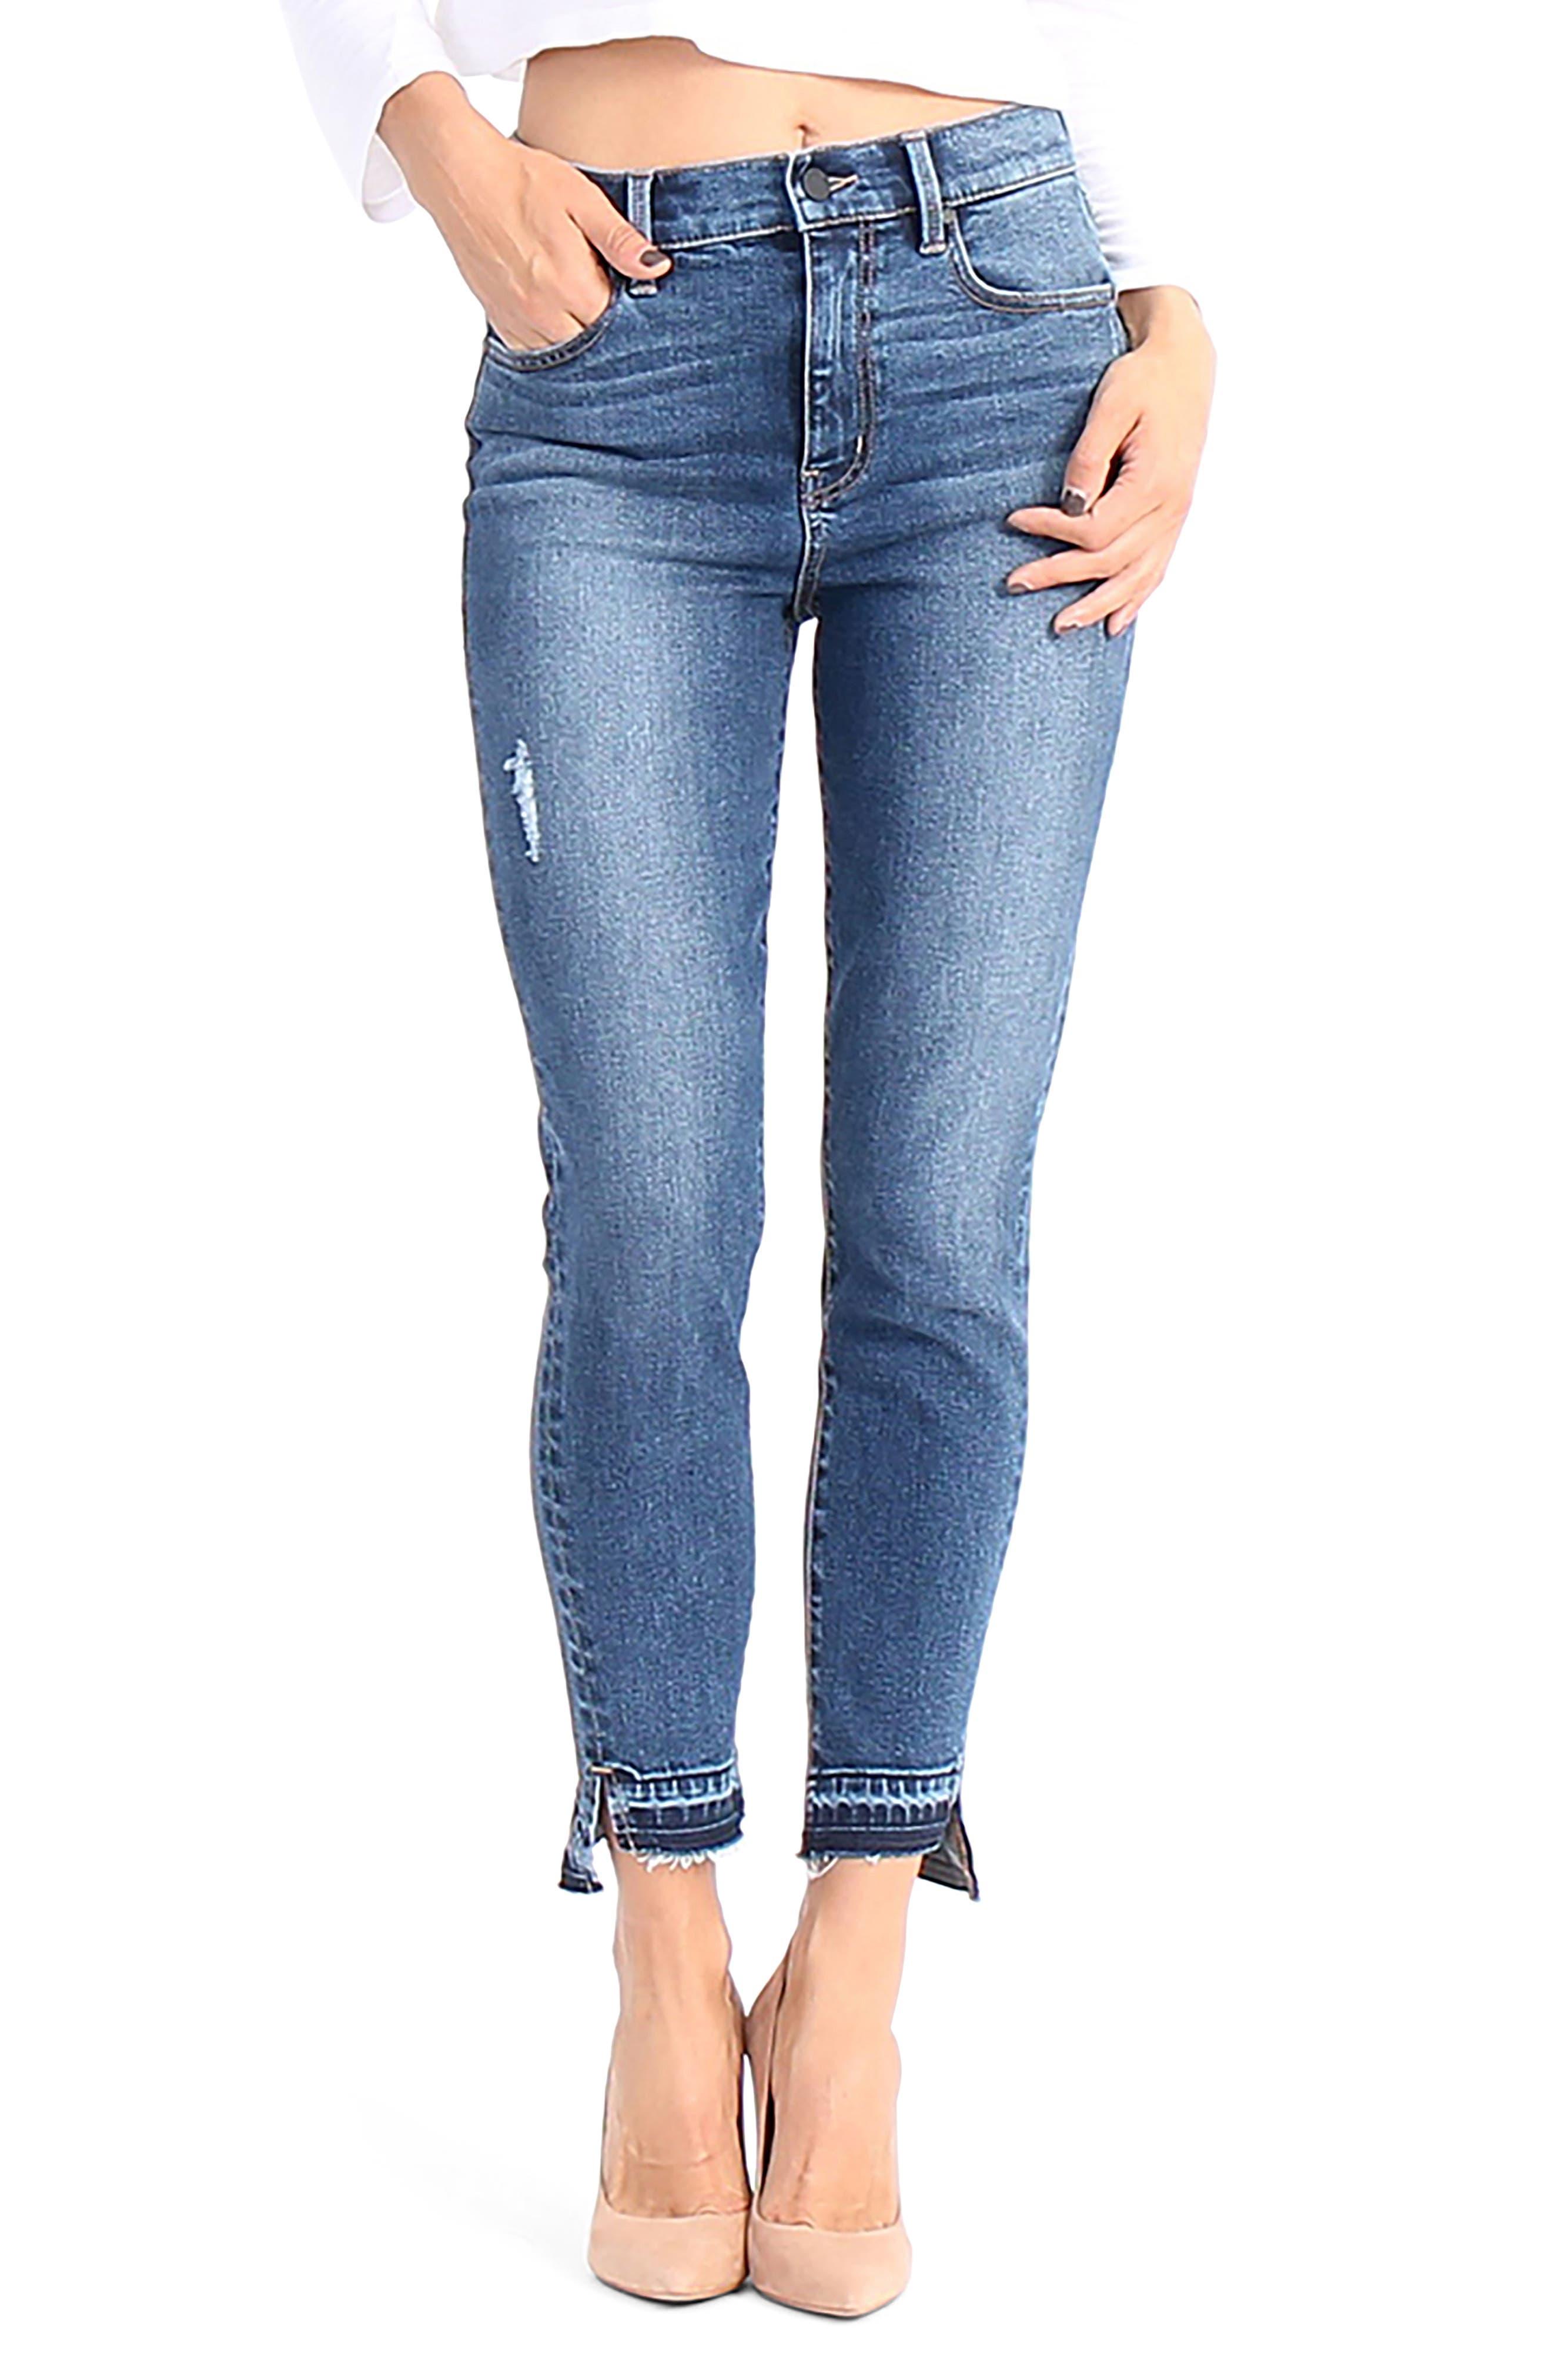 Main Image - Level 99 Elle Uneven Hem Skinny Jeans (After Glow)